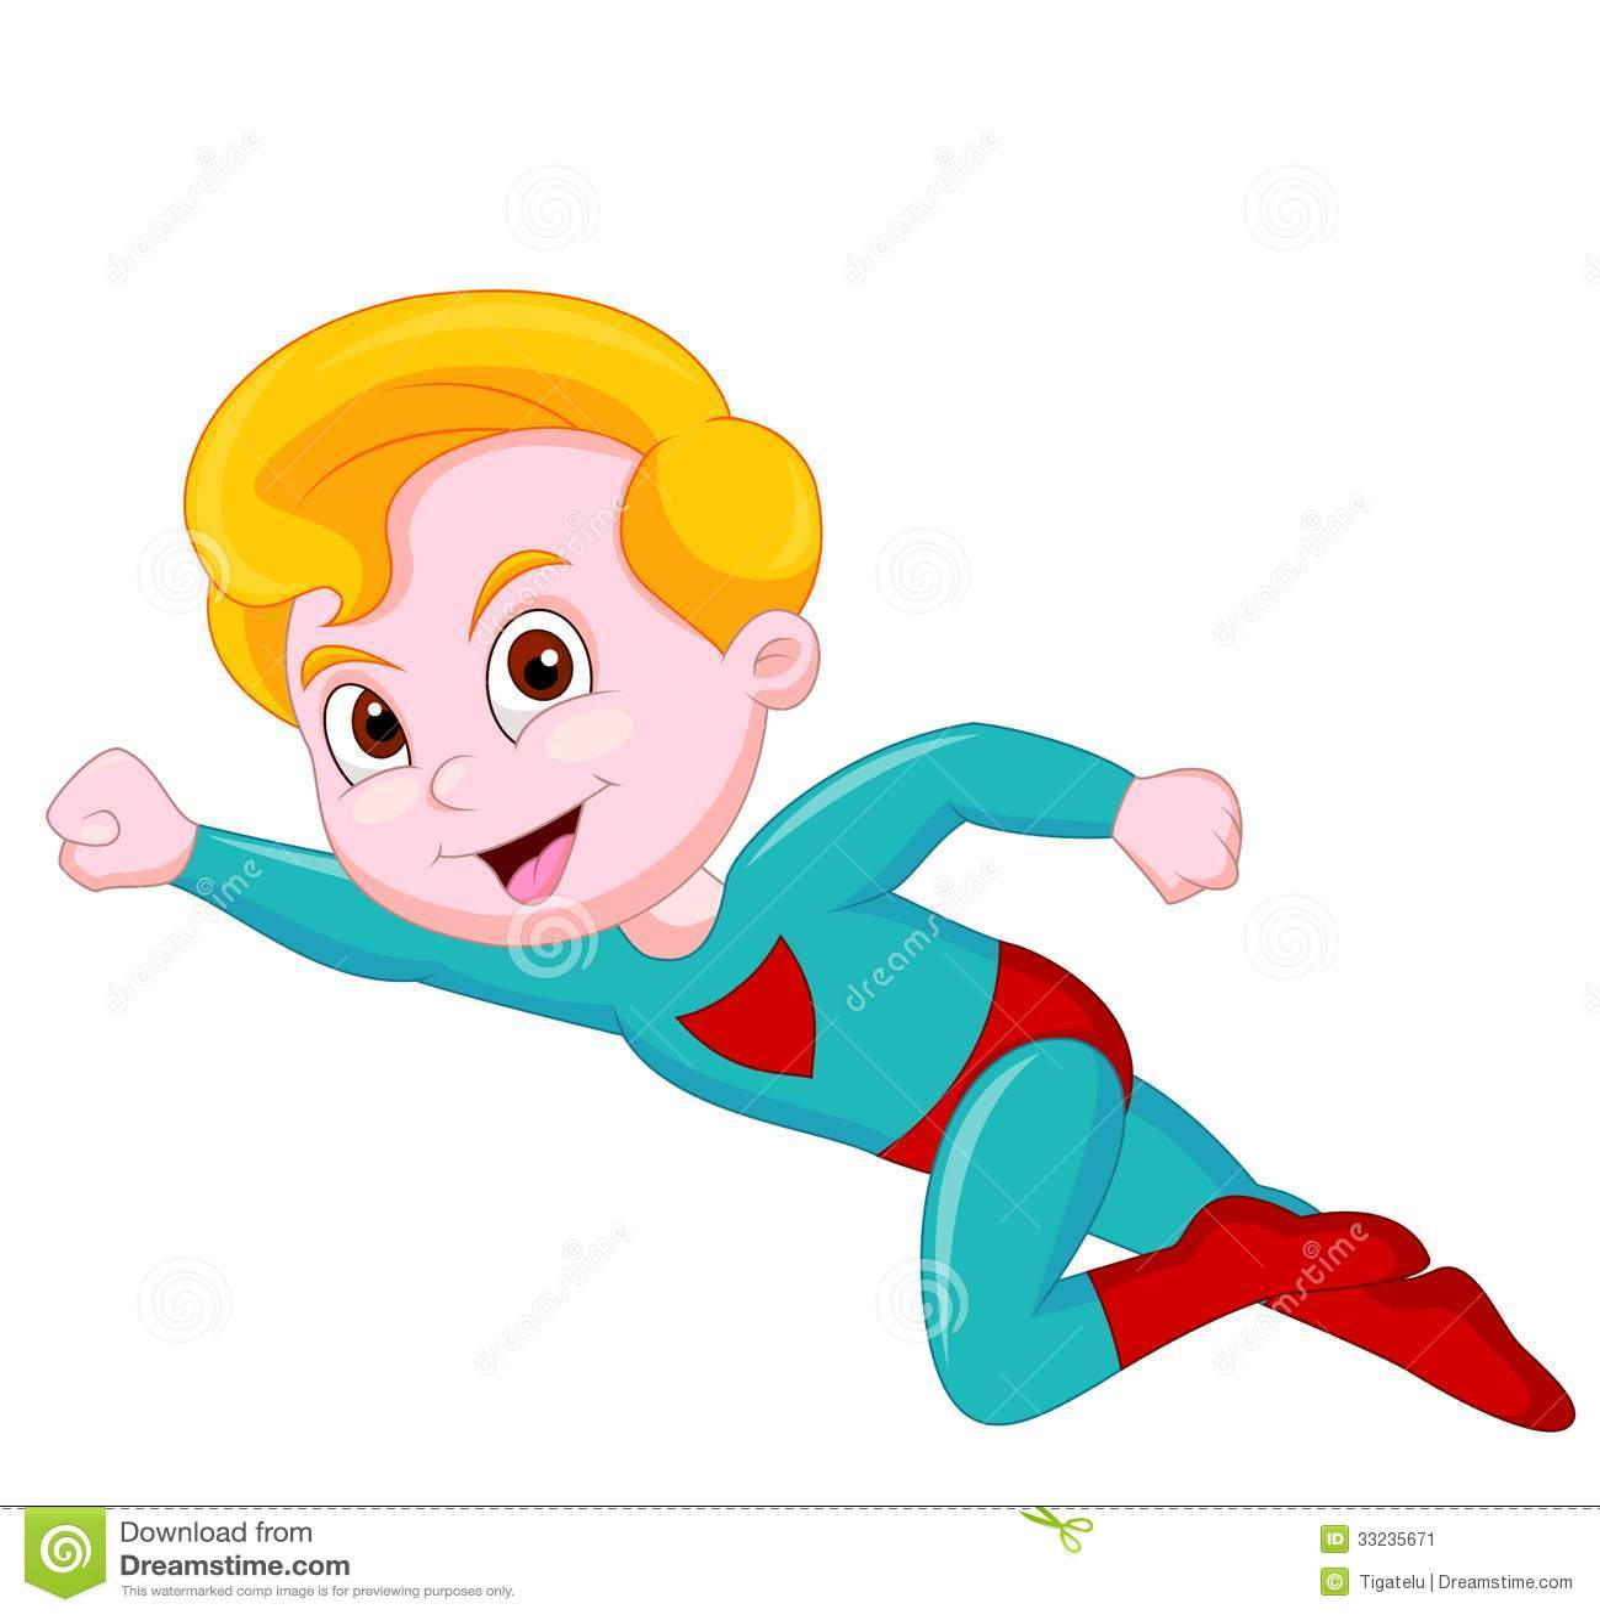 Superhero Kid Cartoon Stock Image - Image: 33235671 Superhero Flying Vector